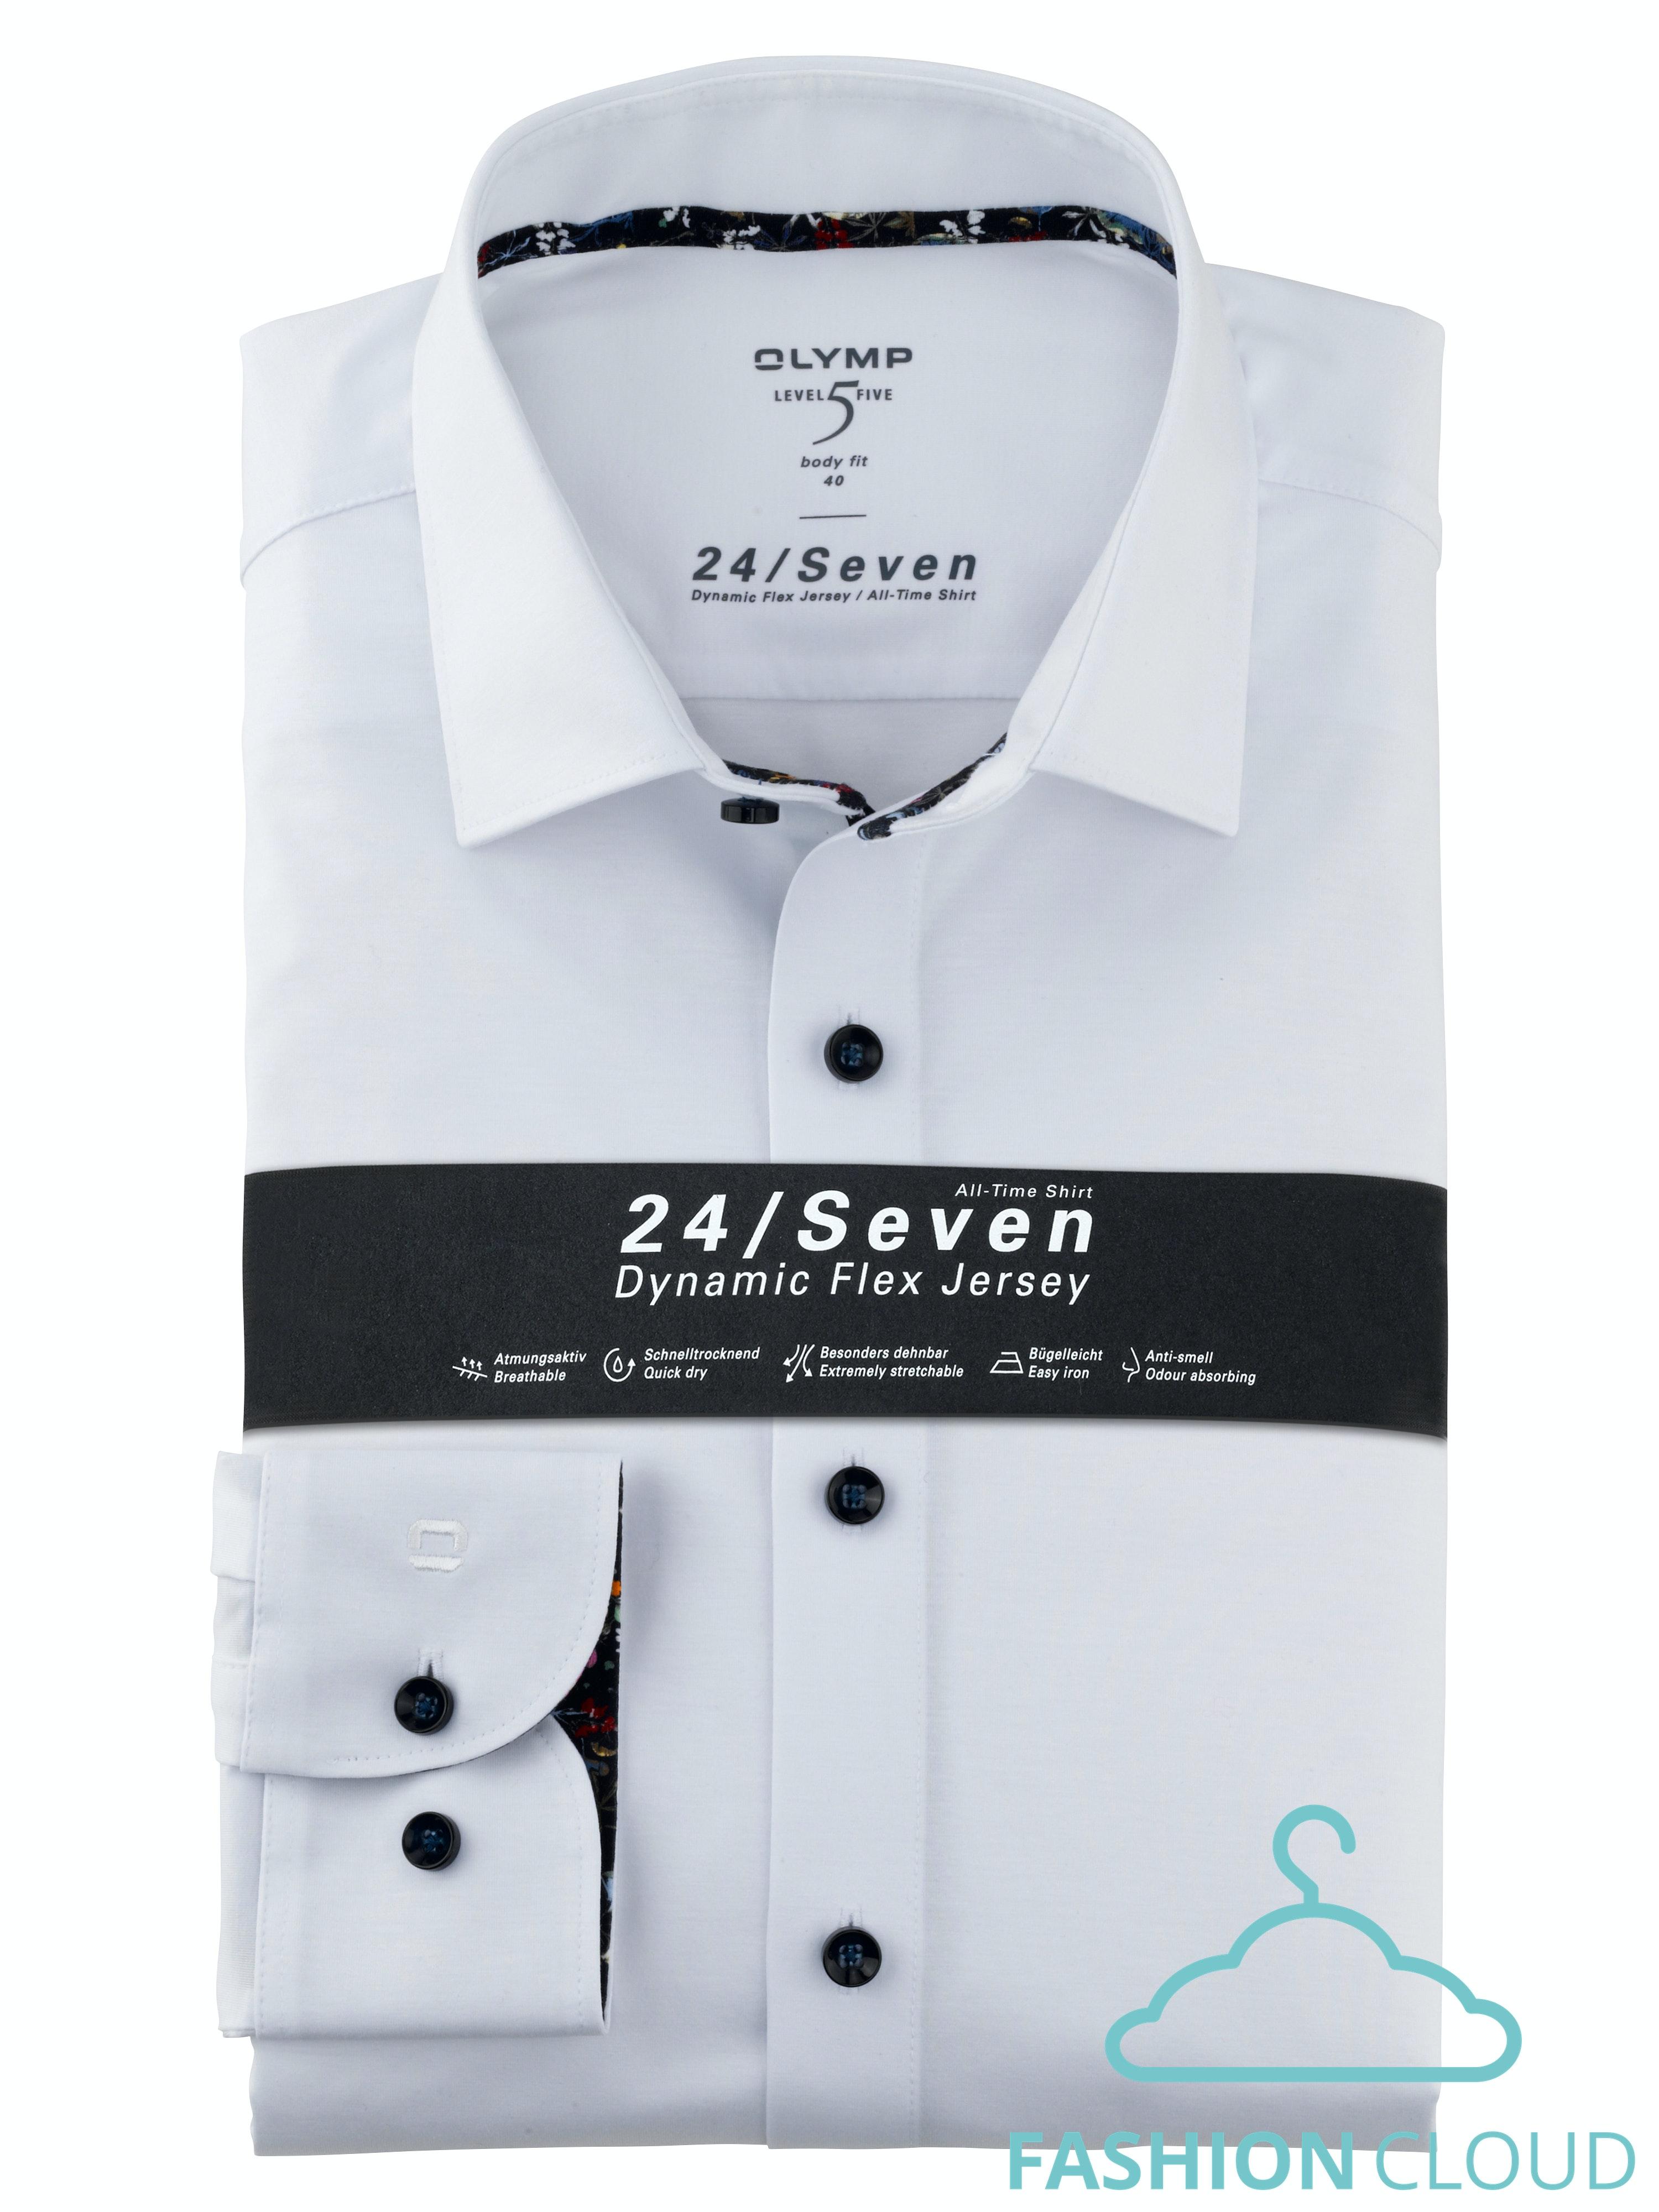 2014/74 Hemden